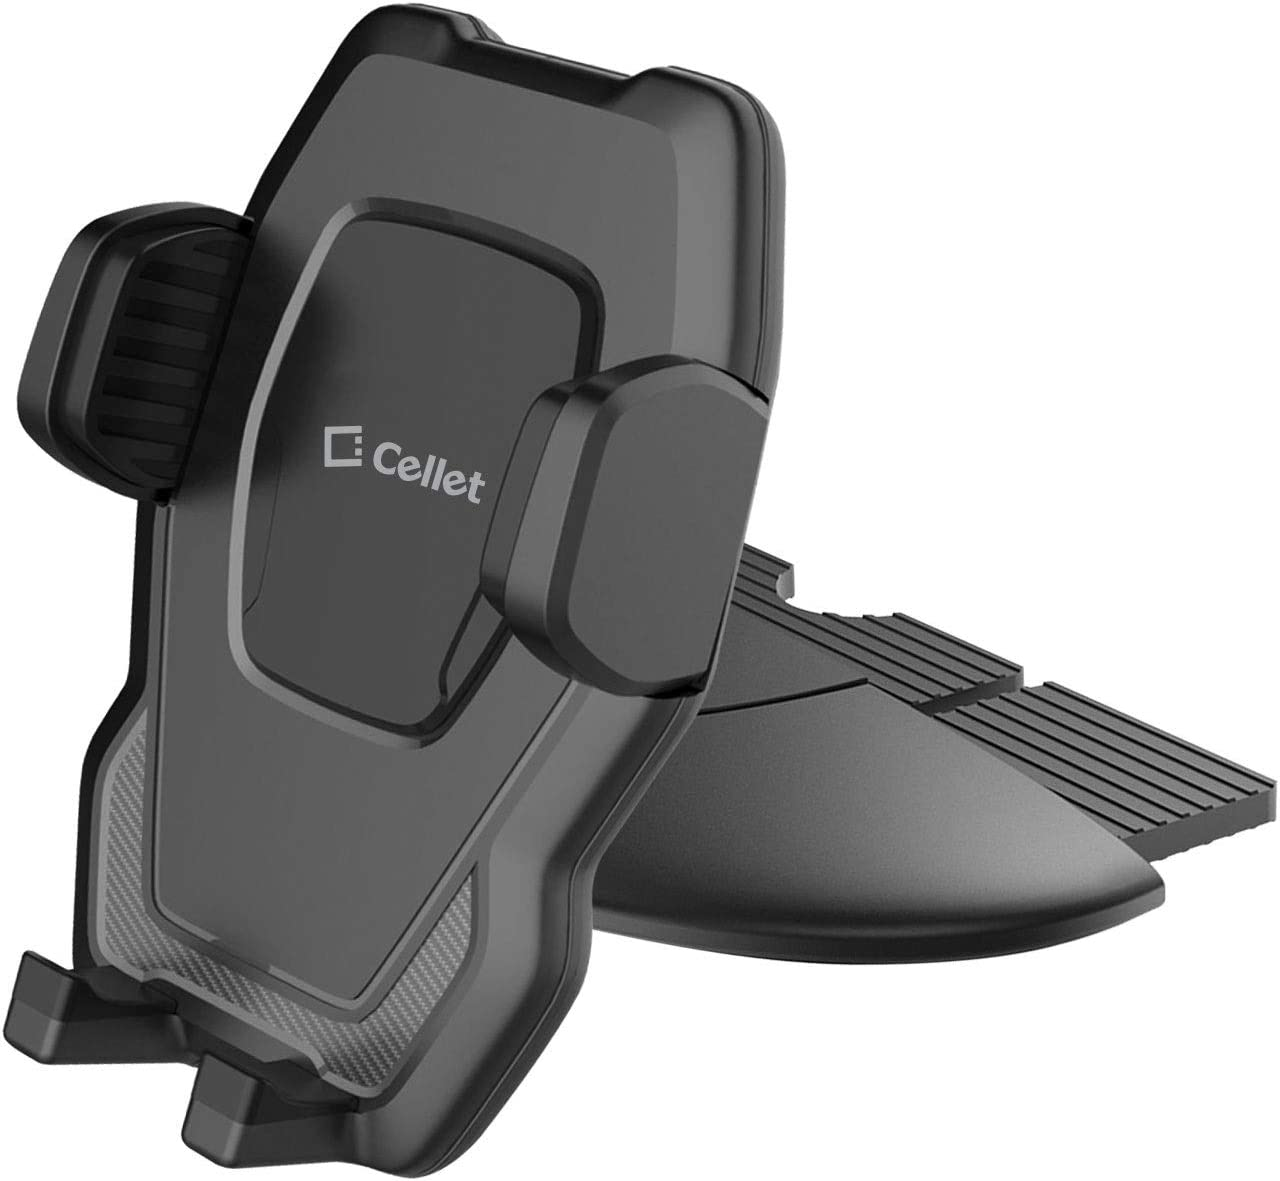 cellet cd slot mobile phone holder